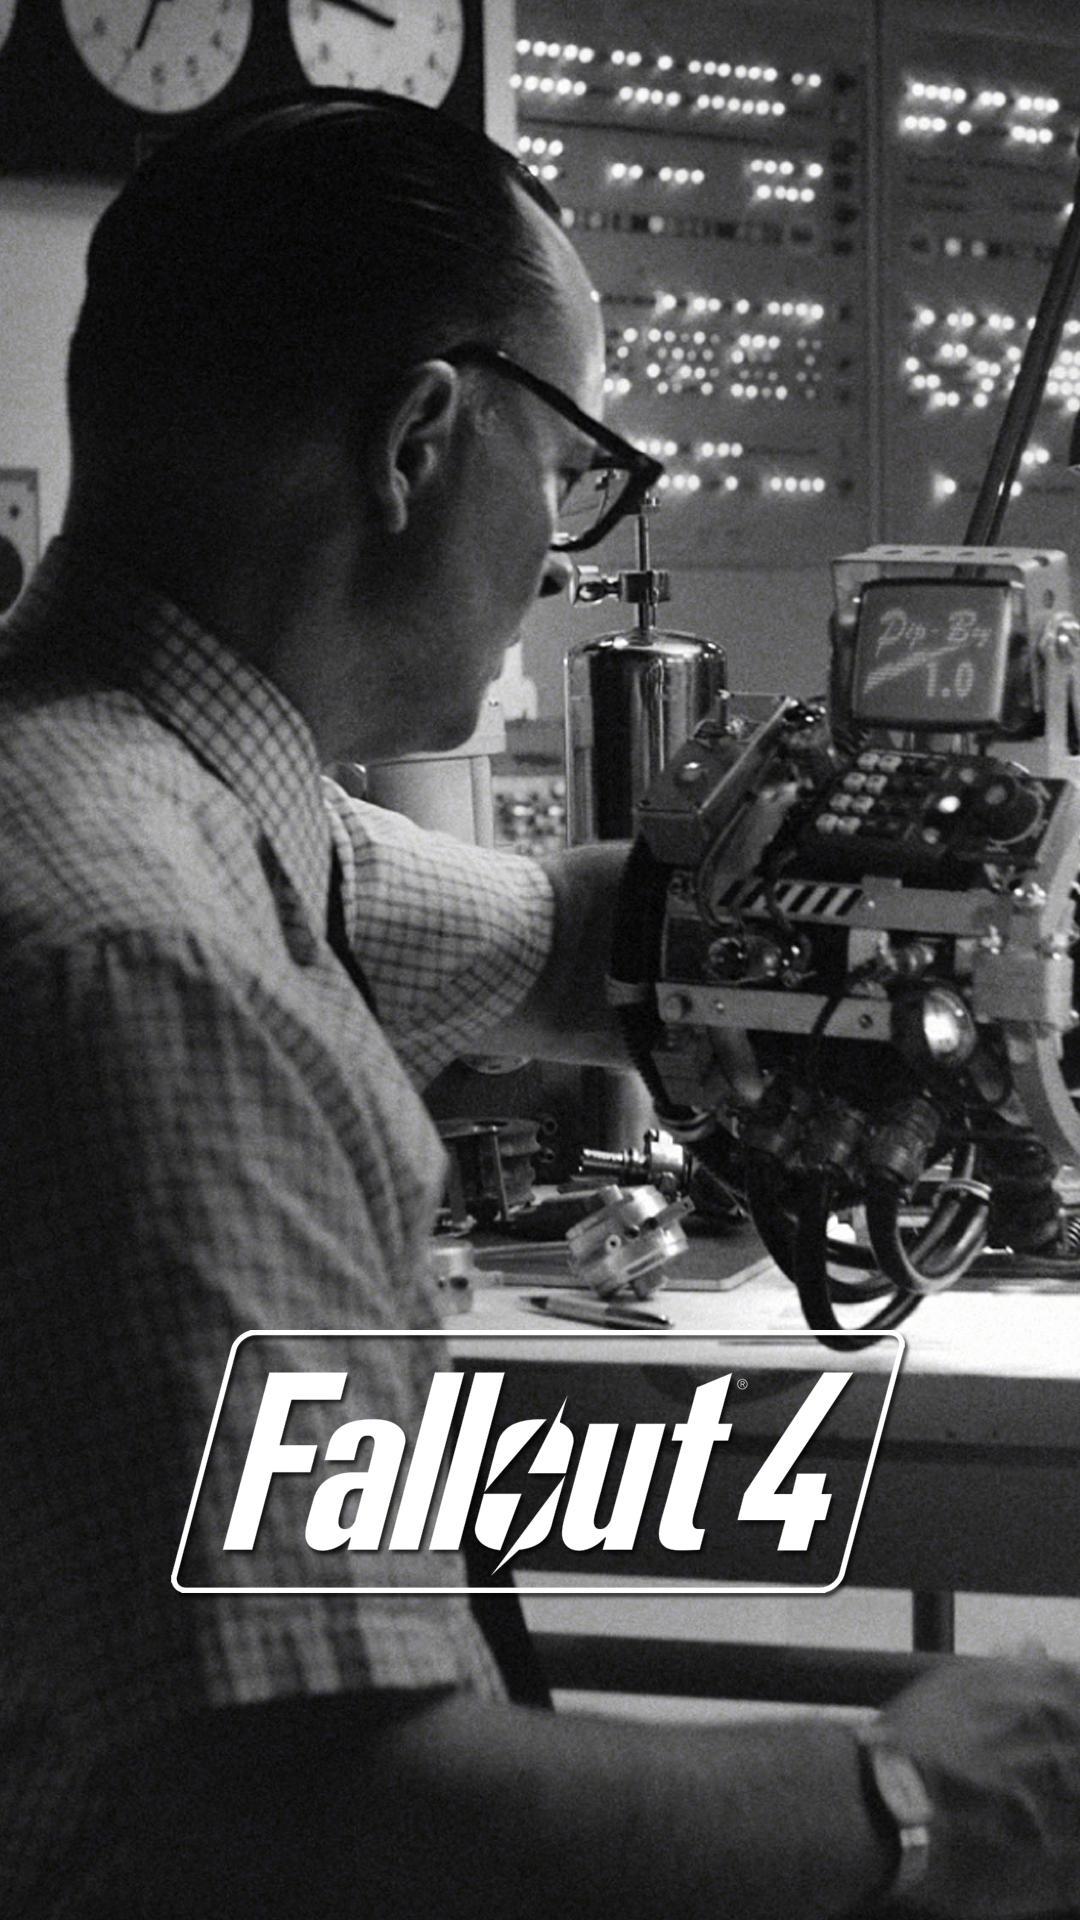 50+ Fallout 4 iPhone Wallpaper on WallpaperSafari